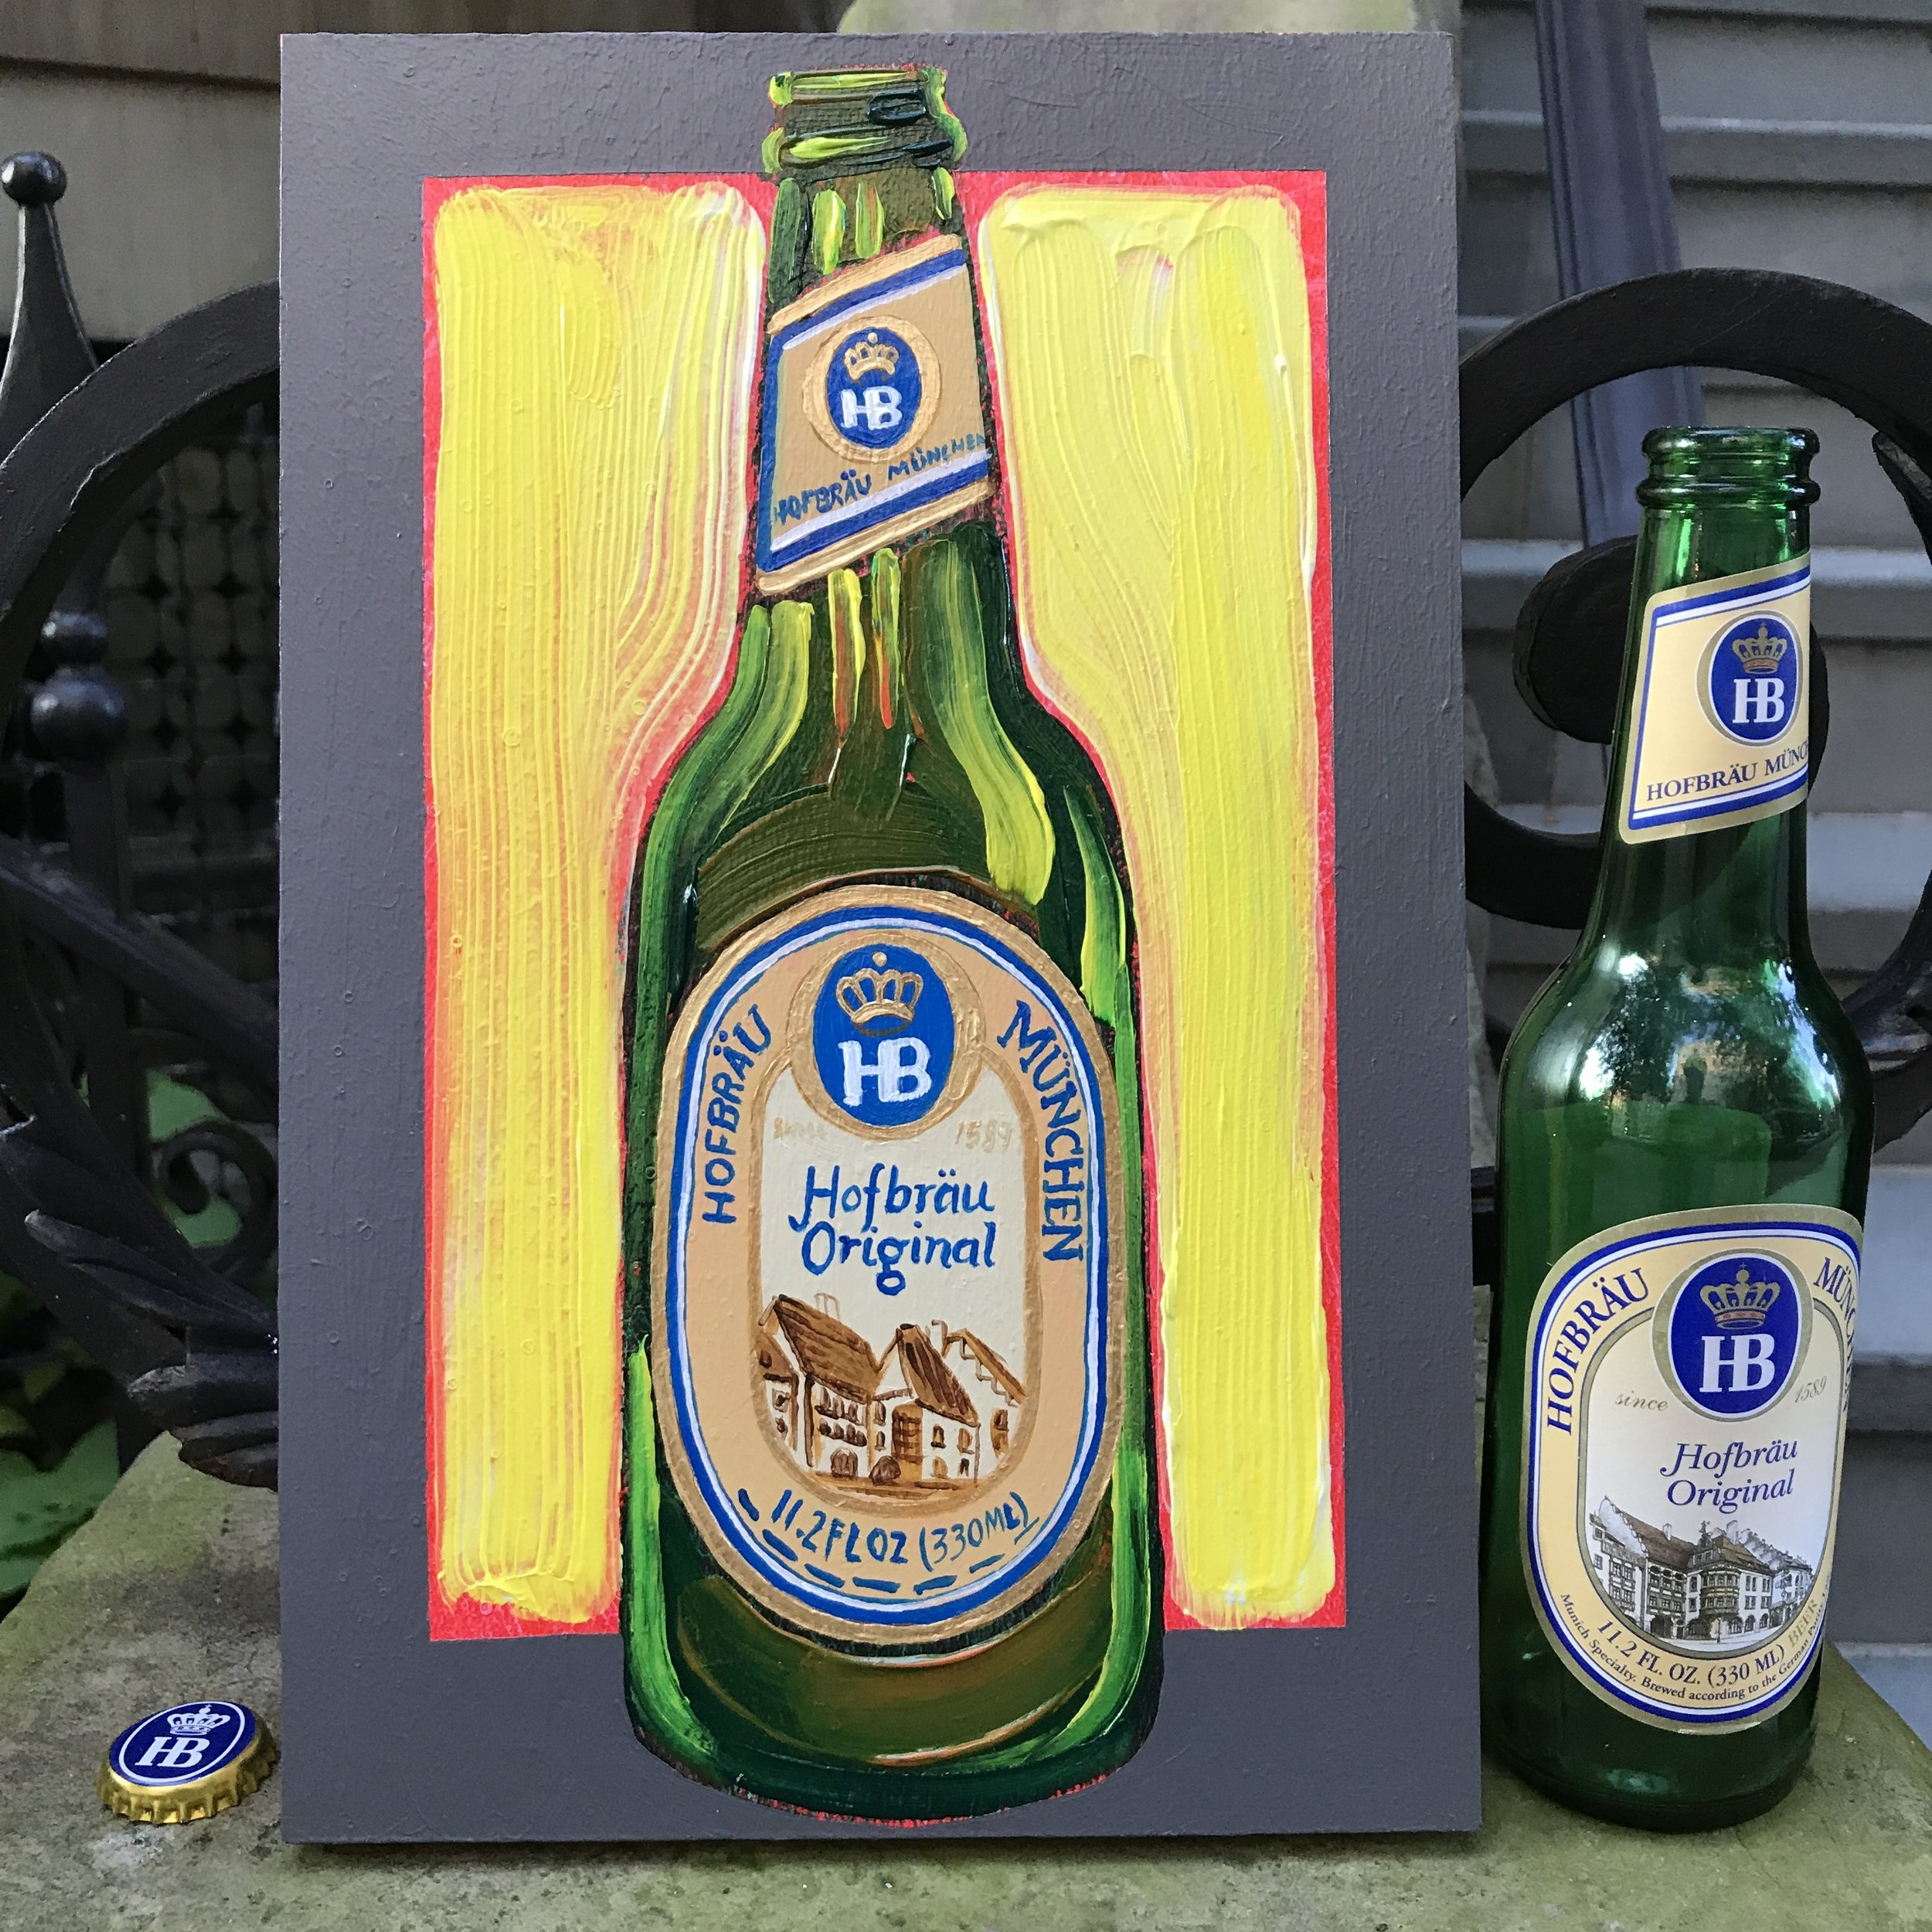 25 Hofbräu Original (Germany)